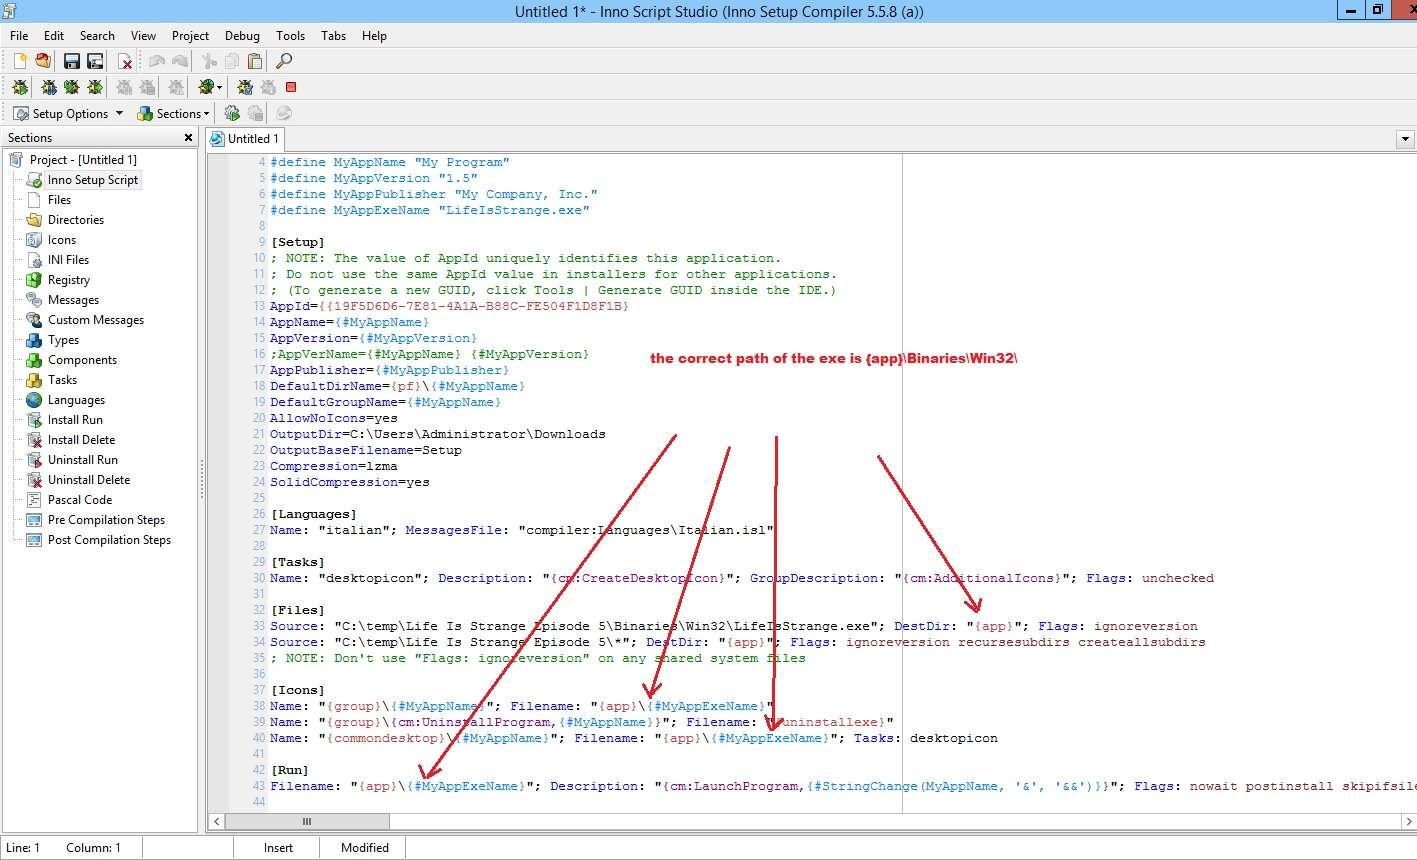 Inno Setup Studio - Install the main application executable file to